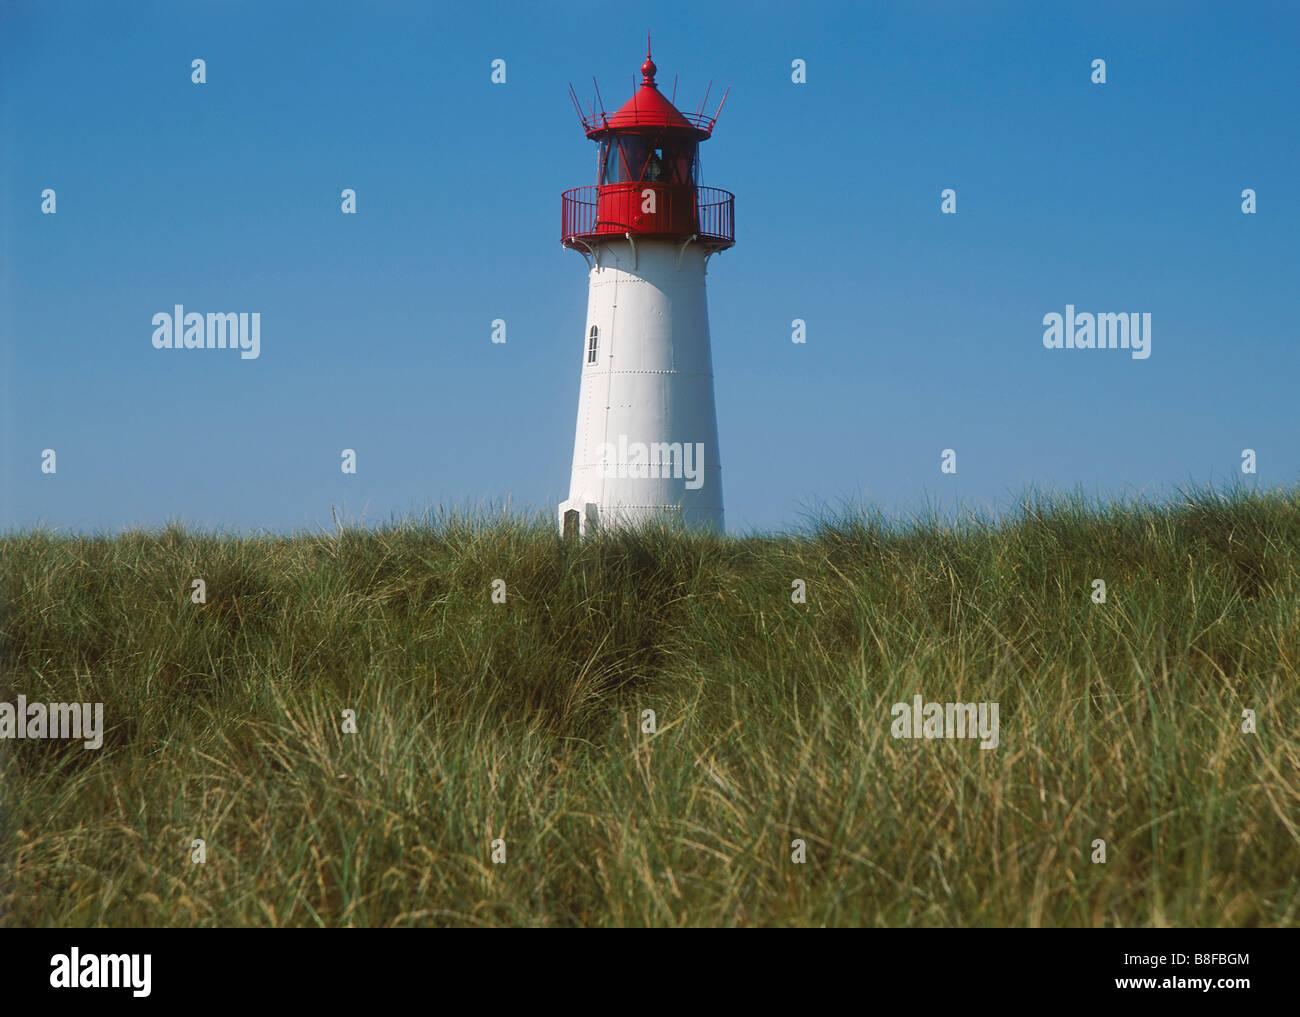 Lighthouse near List, Sylt island, Schleswig-Holstein, Germany - Stock Image